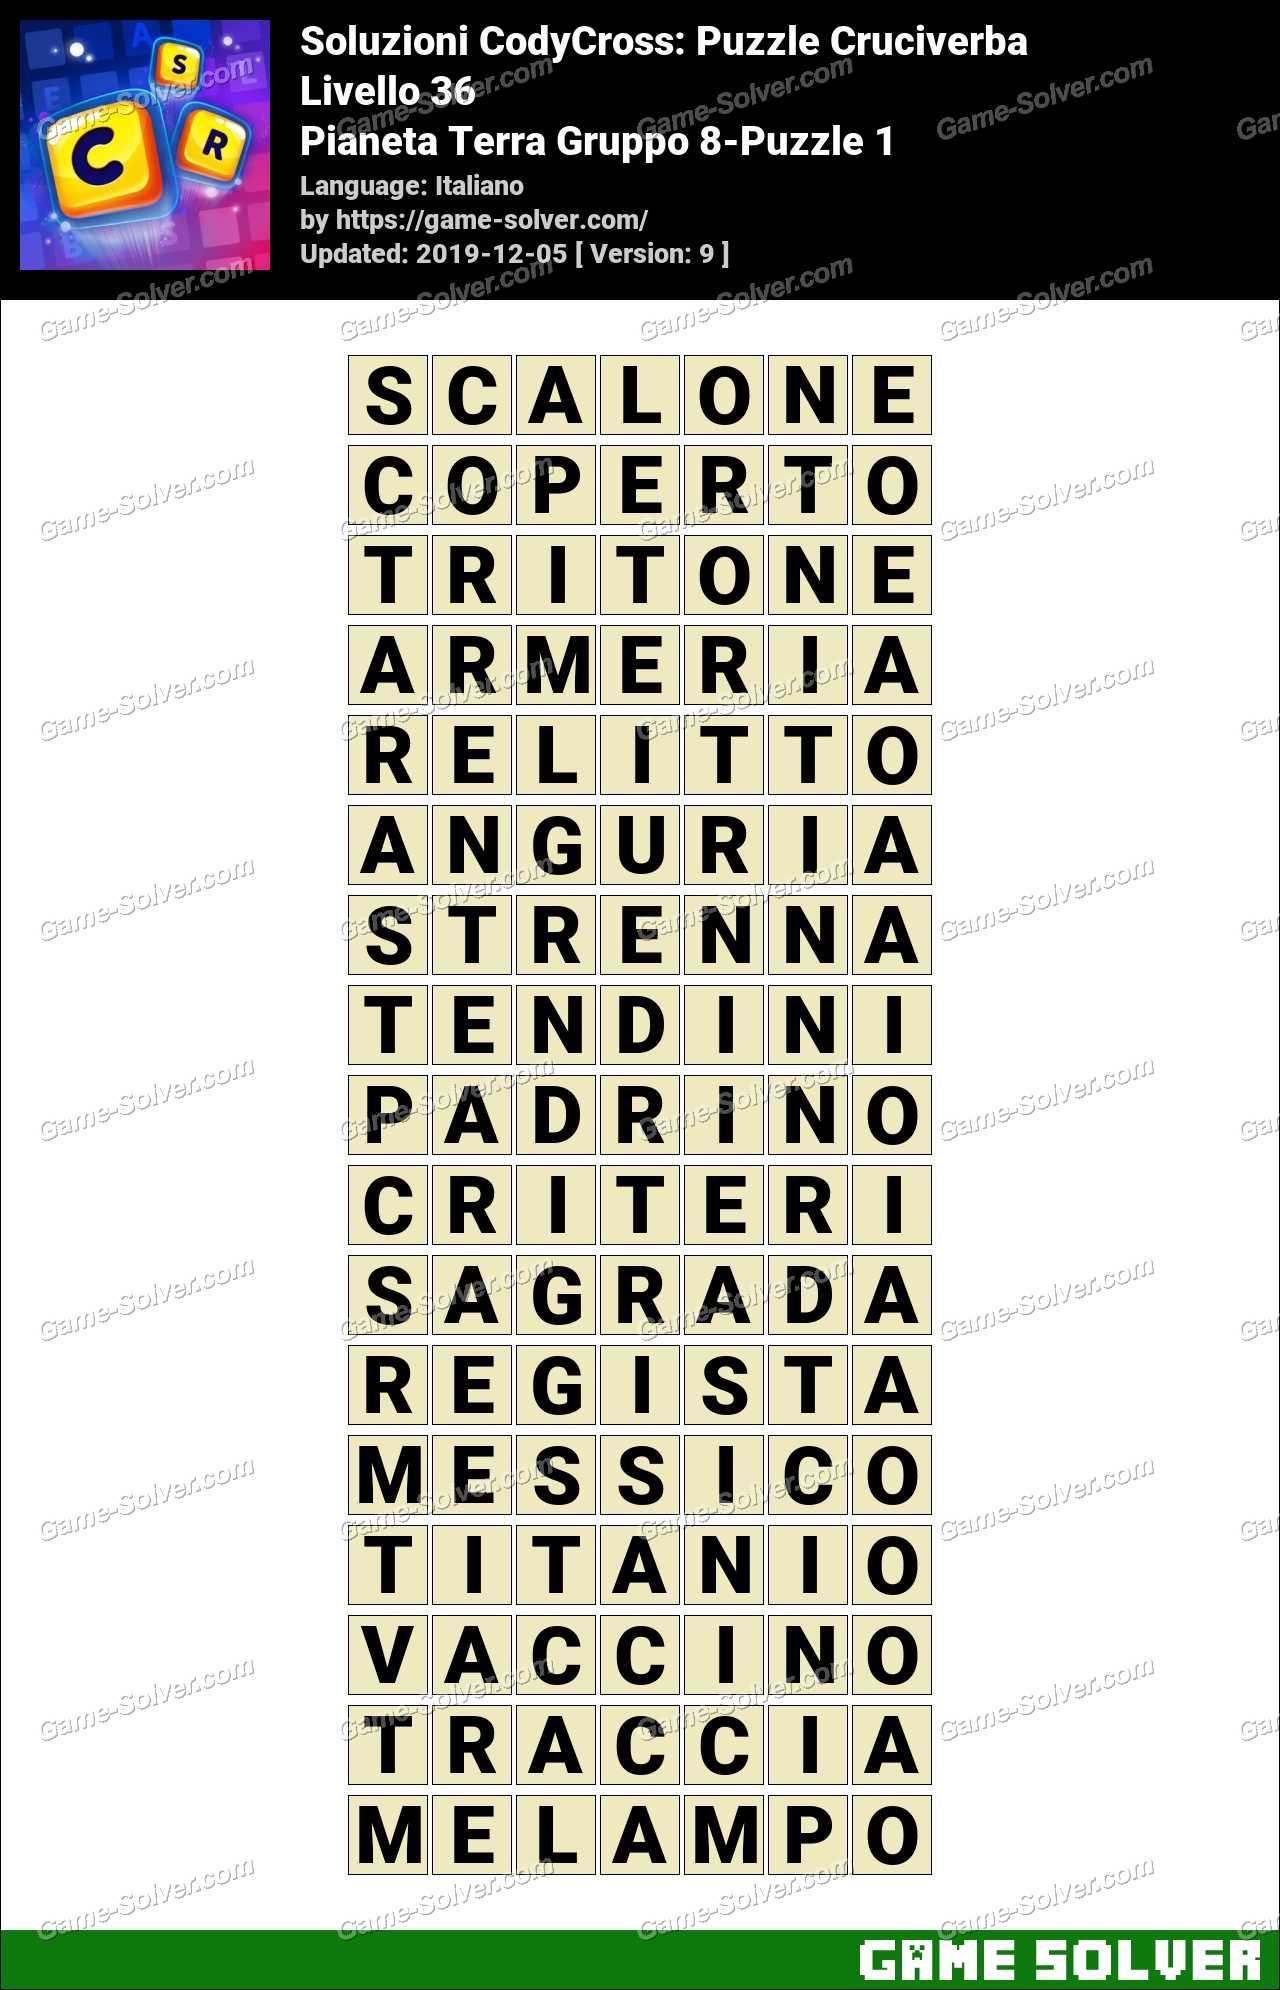 Soluzioni CodyCross Pianeta Terra Gruppo 8-Puzzle 1